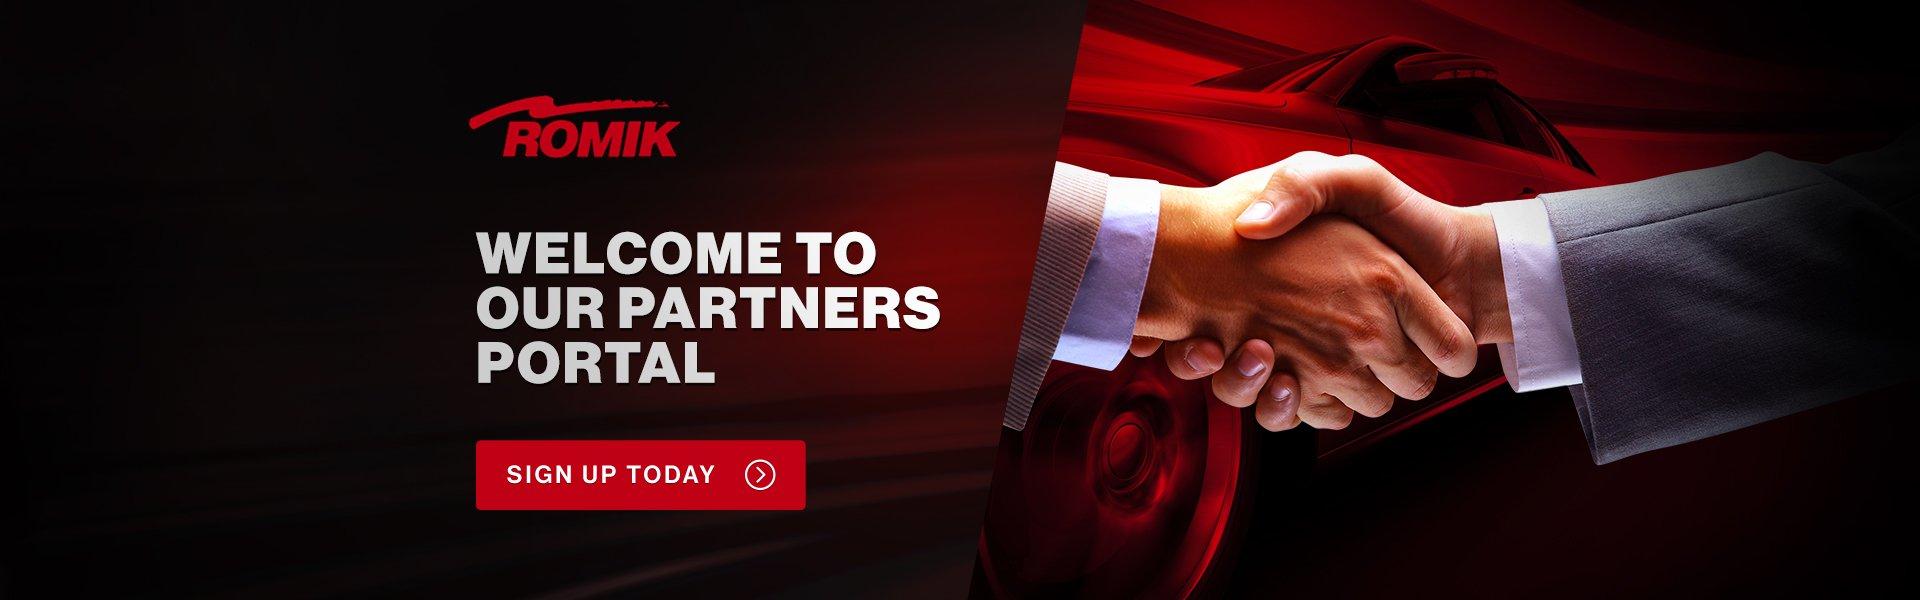 https://partners.romik.com/customer/account/create/